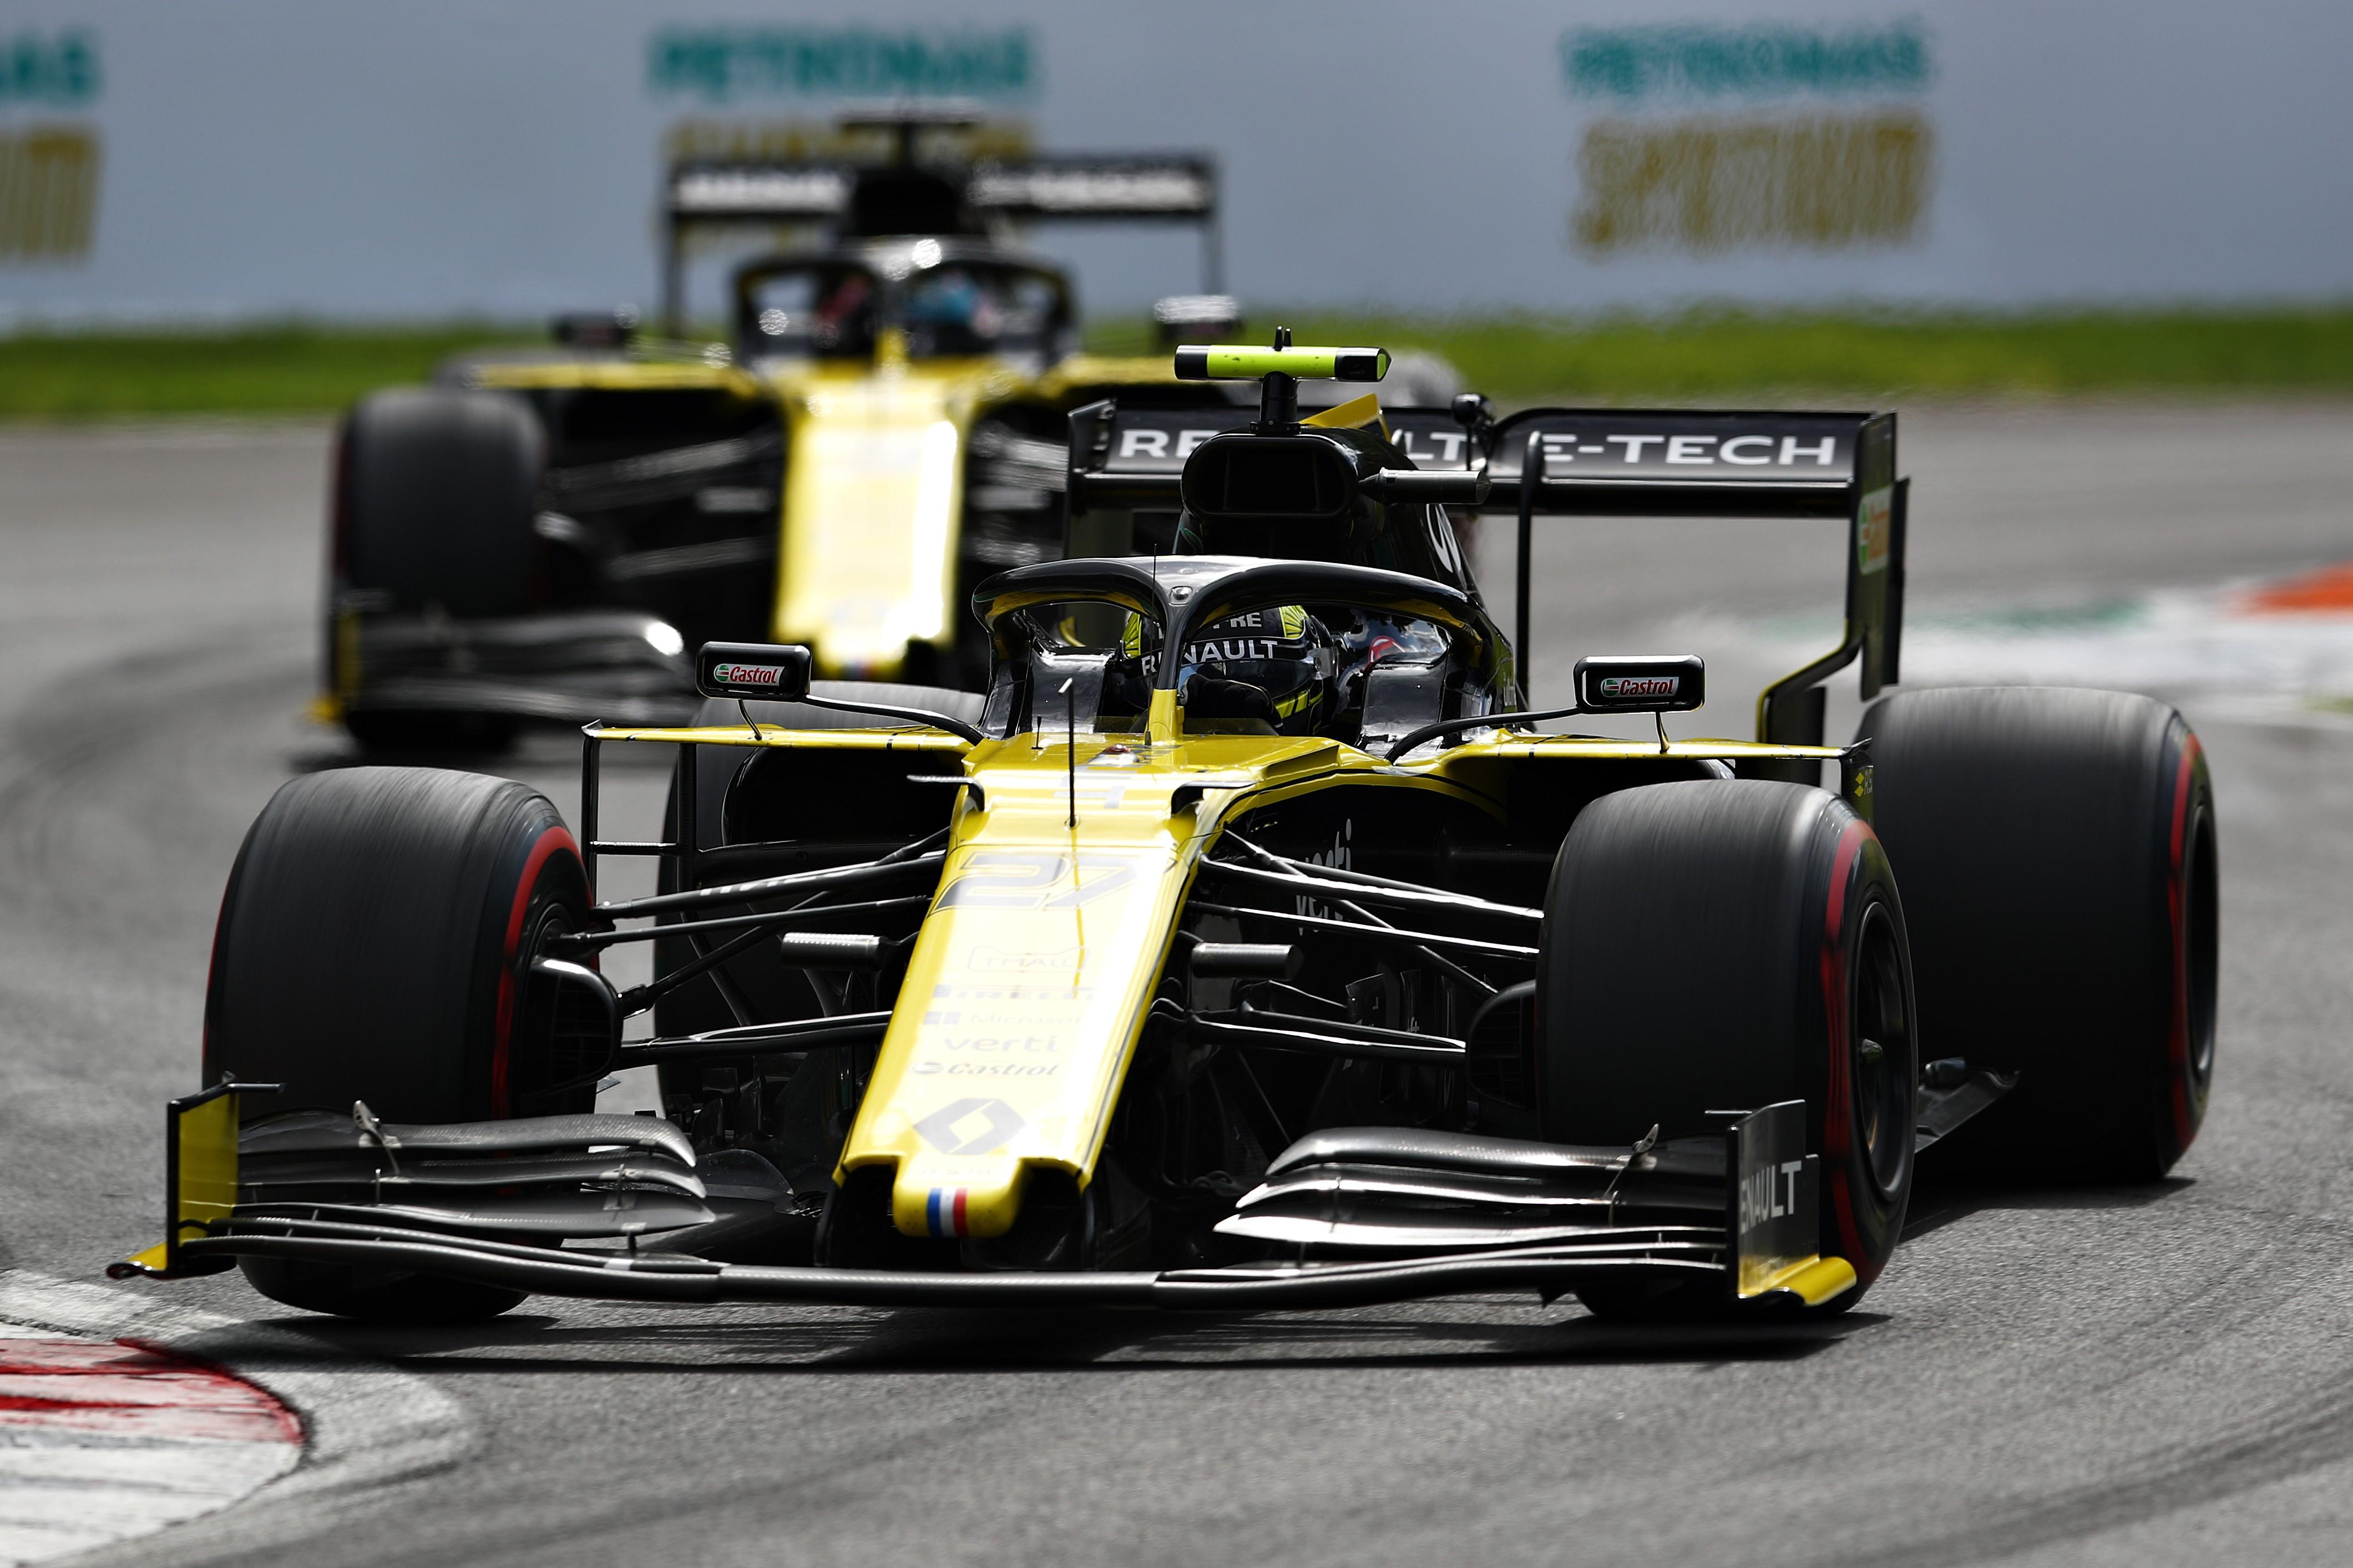 Nico Hülkenberg et Daniel Ricciardo (Renault) au Grand Prix d'Italie 2019